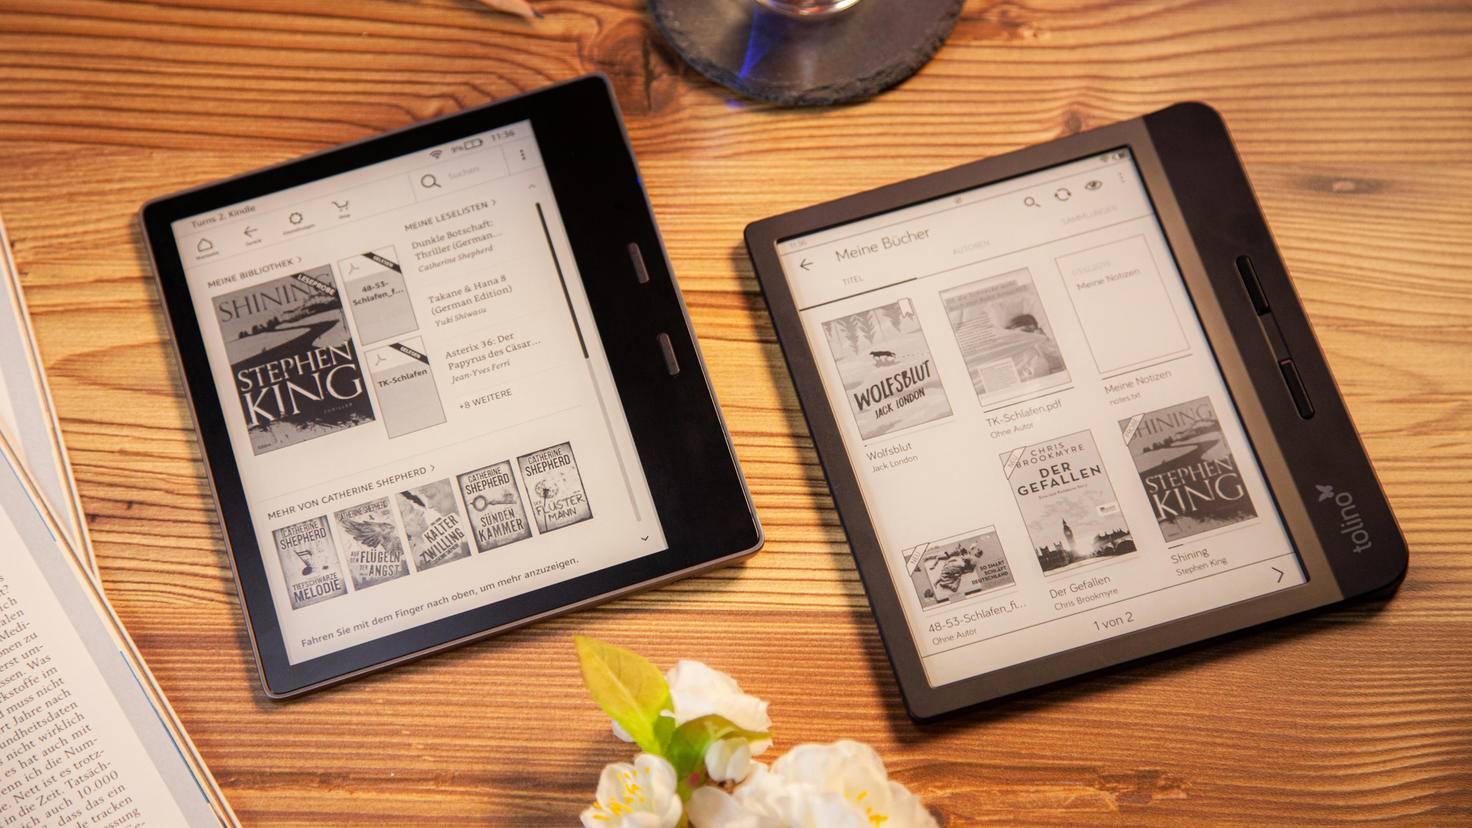 Kindle Oasis 2019 vs Tolino vision 5